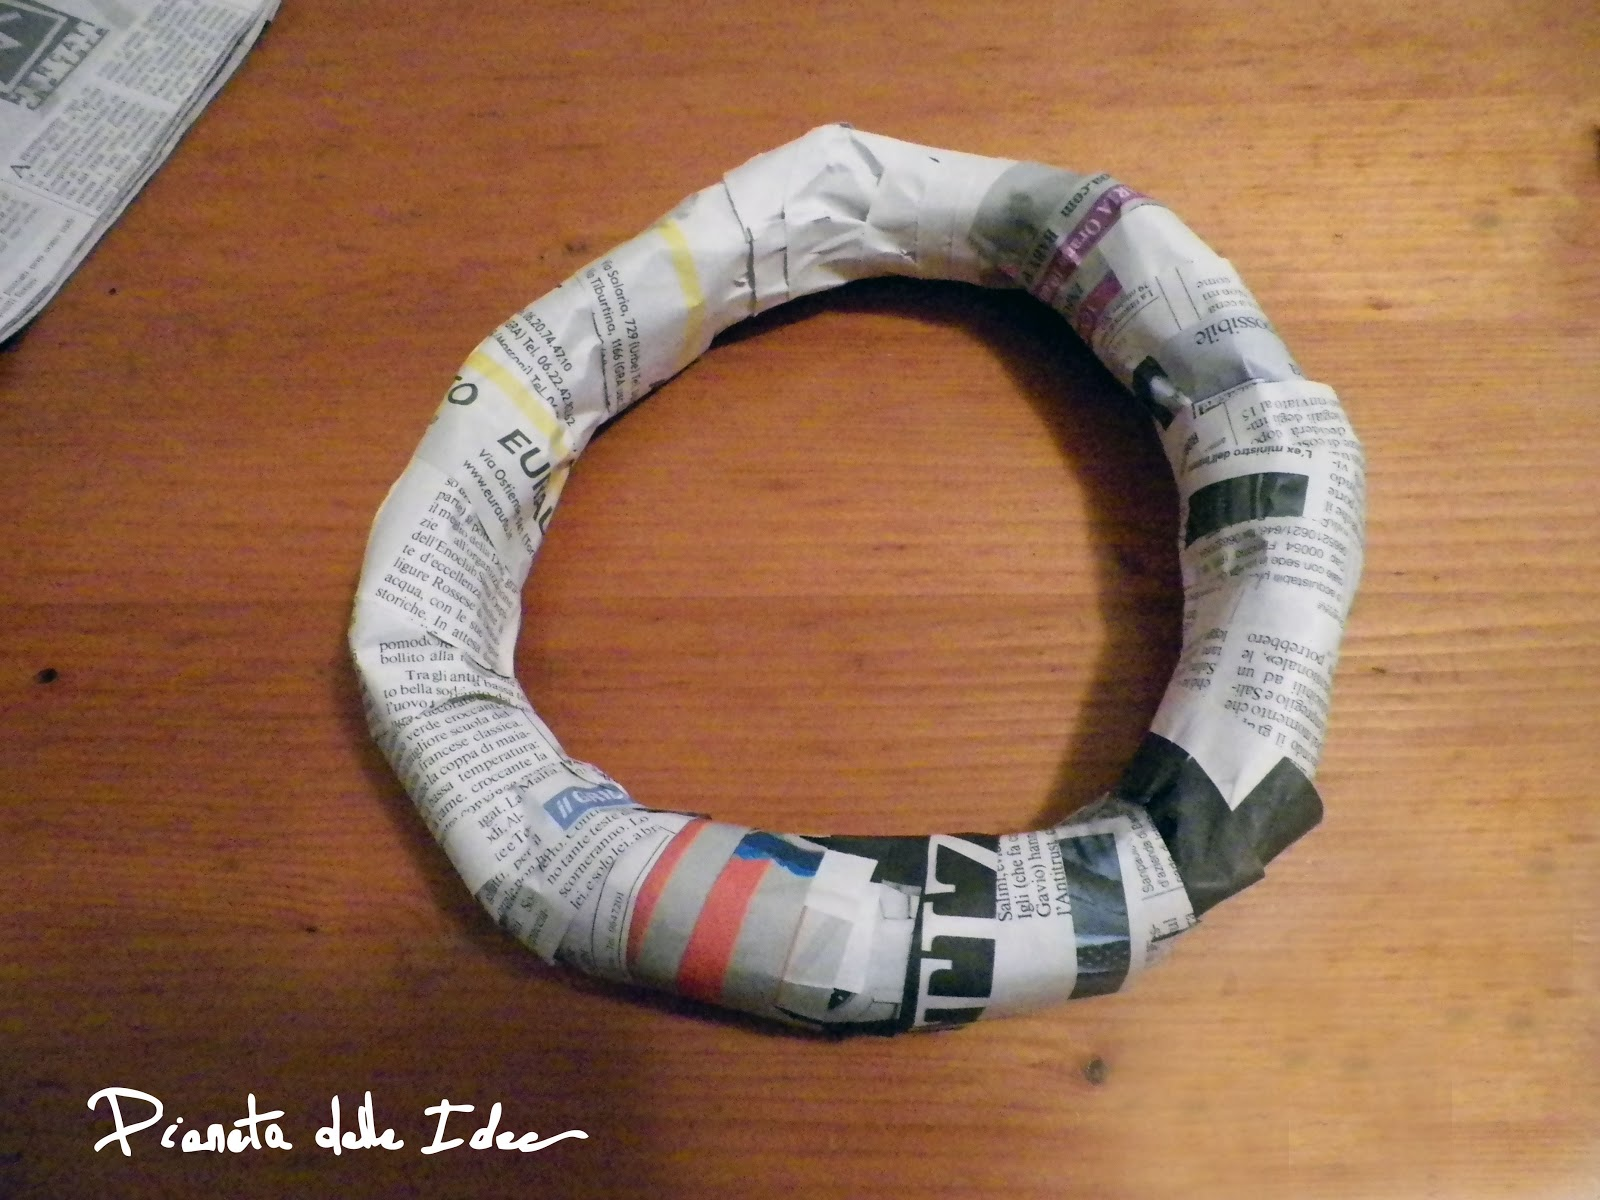 Ghirlanda di carta fai da te pianeta delle idee - Ghirlanda natalizia per porta fai da te ...